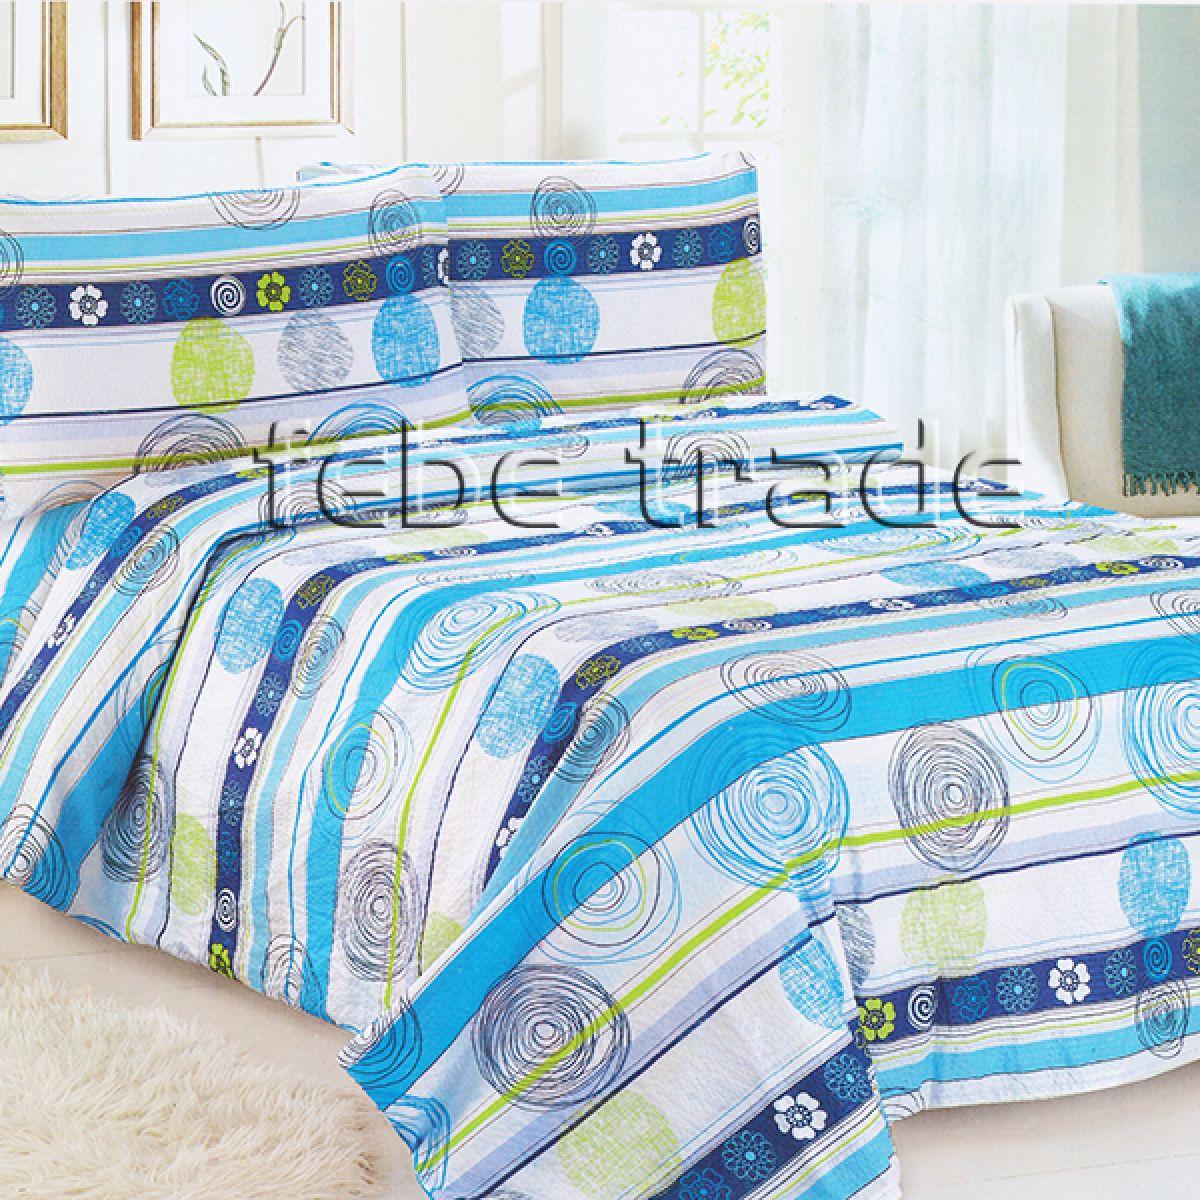 Cheap Beddings - TPR-YP-448 - 220x200cm - 3 pcs